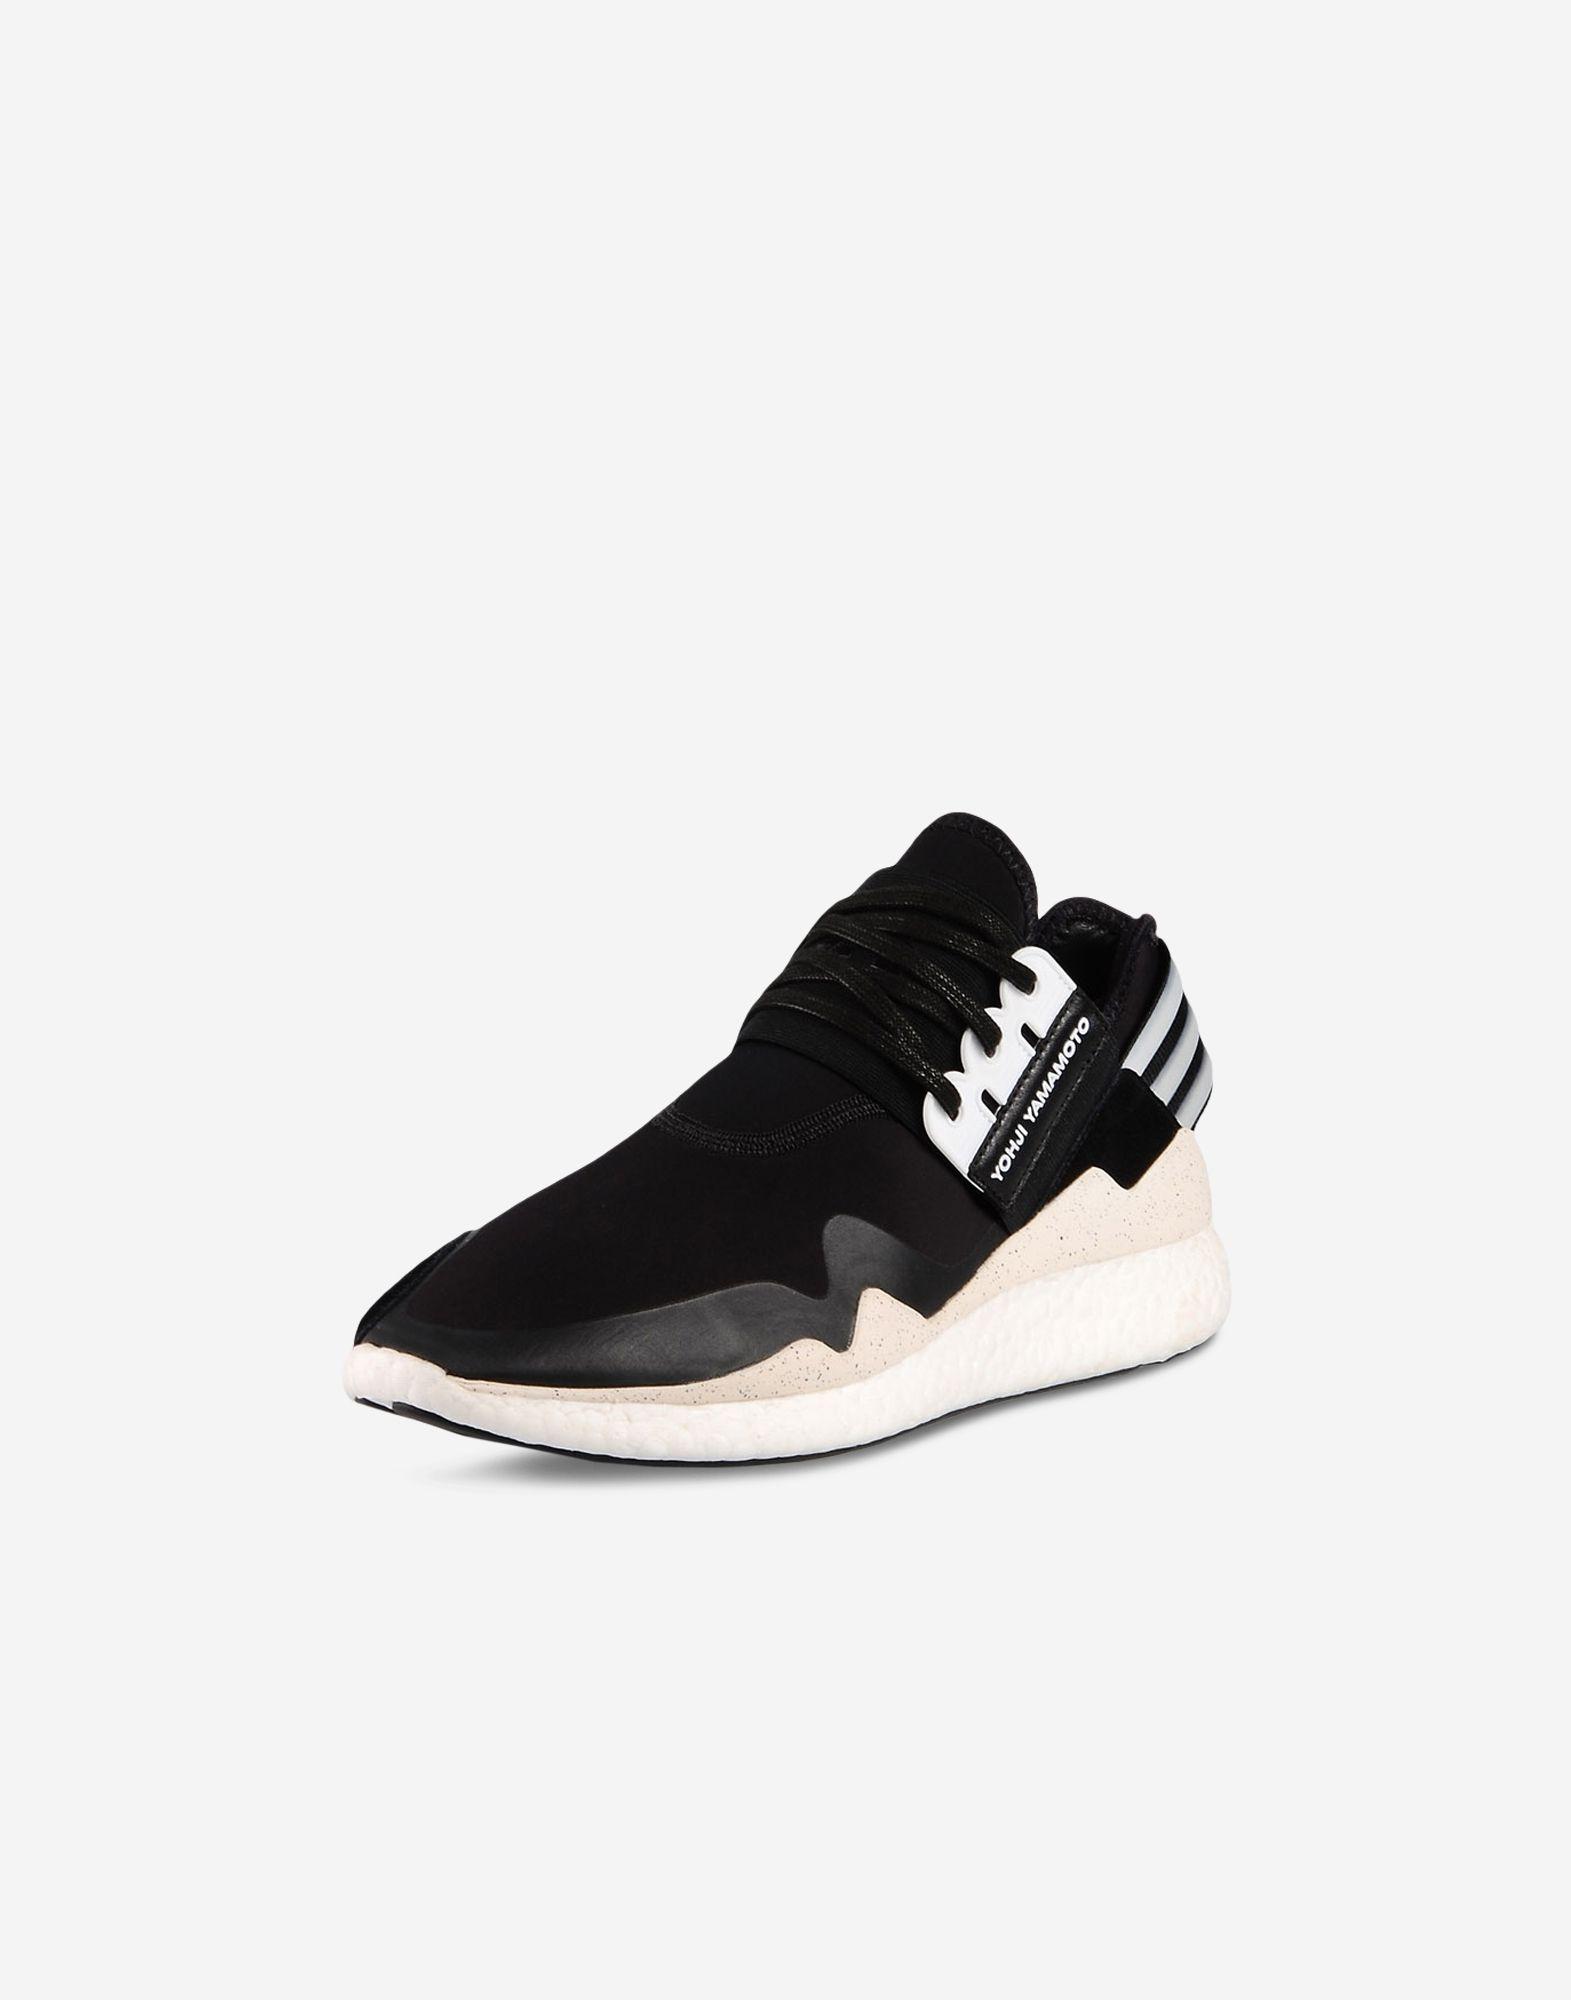 Y 3 RETRO BOOST Sneakers Adidas Y 3 Officielt Websted  Adidas Y 3 Official Site